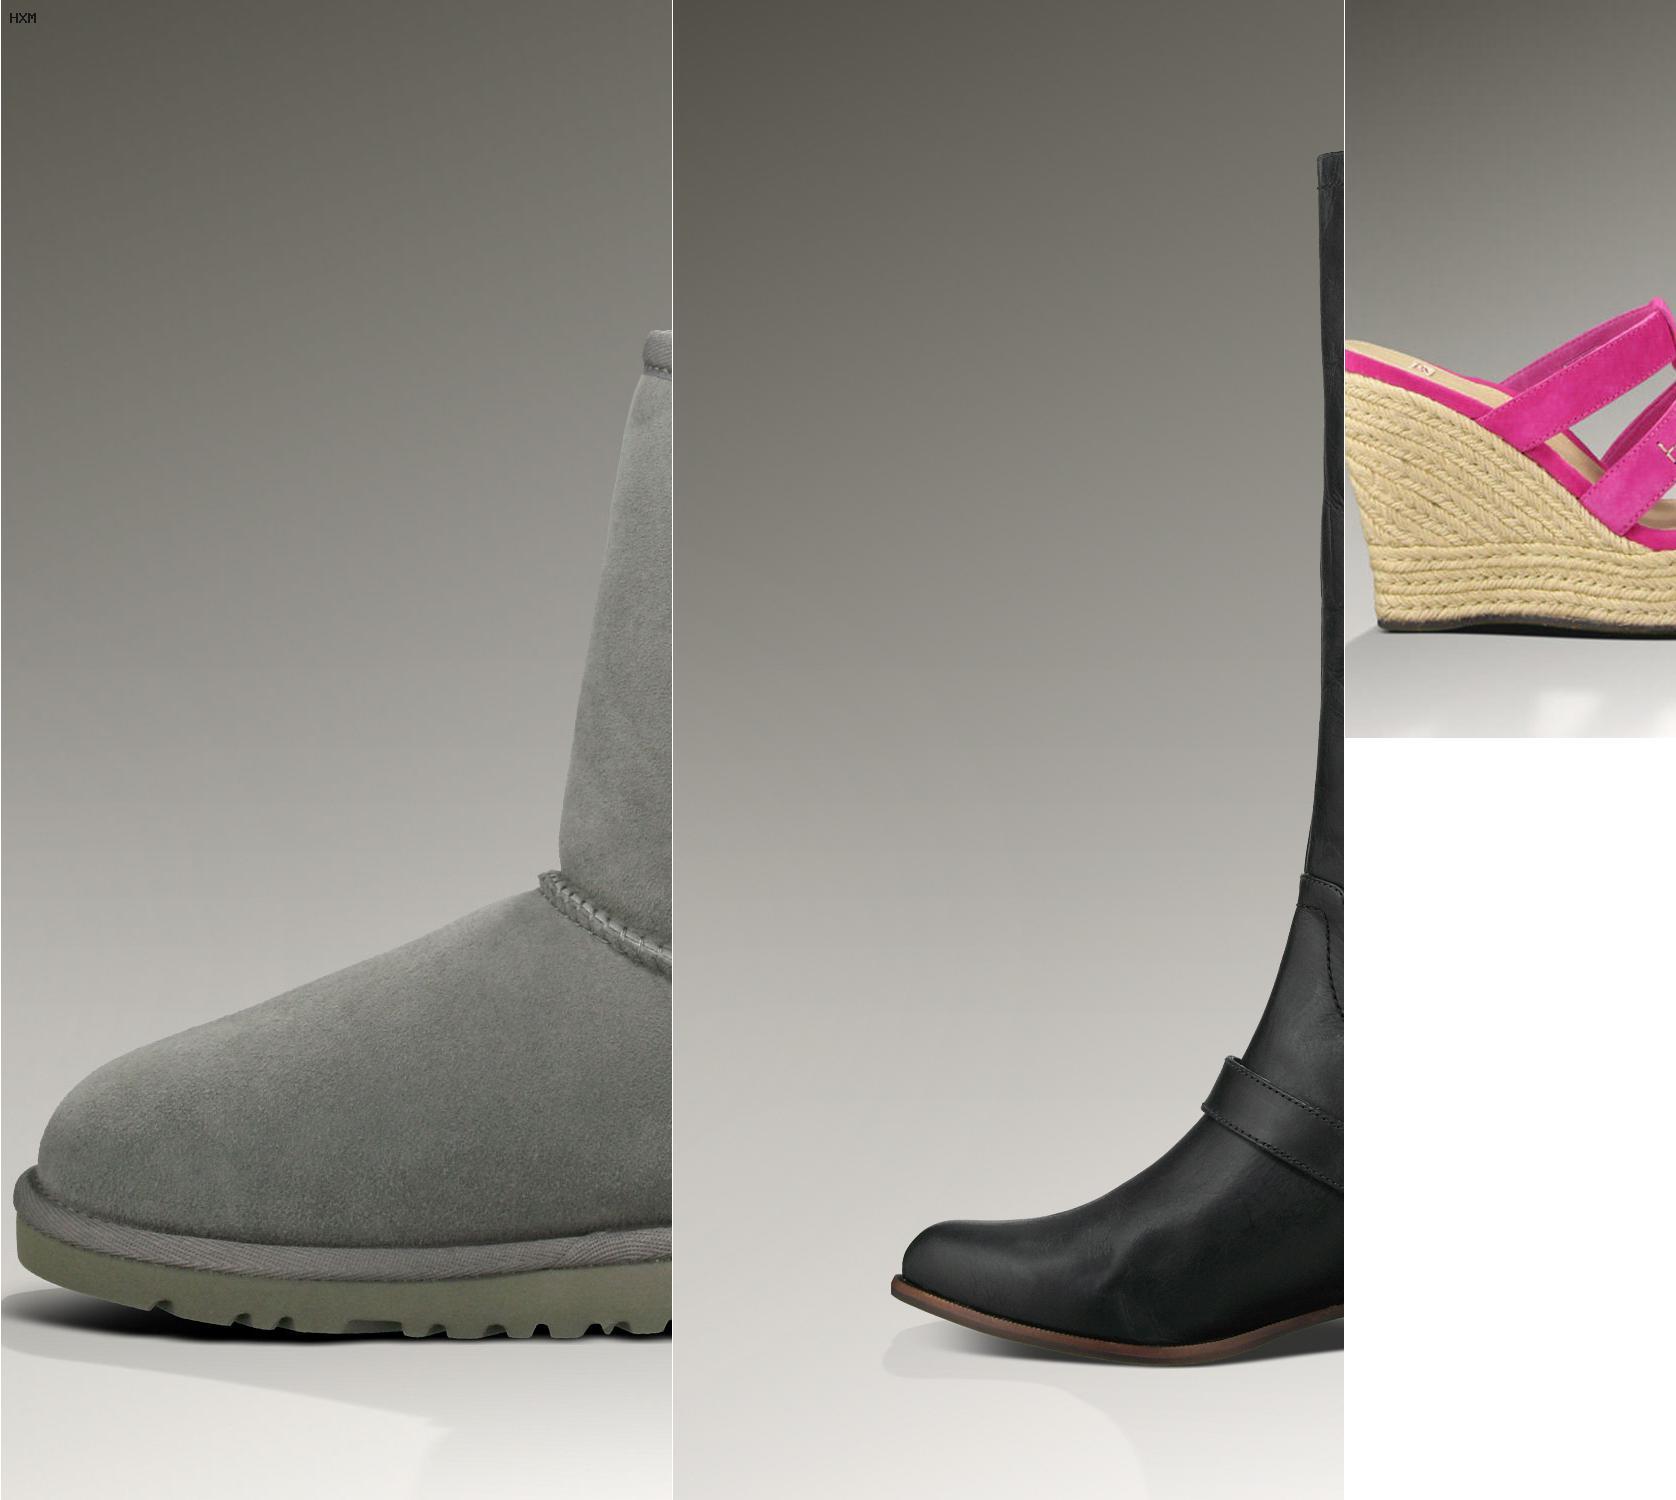 ugg australia boots prix